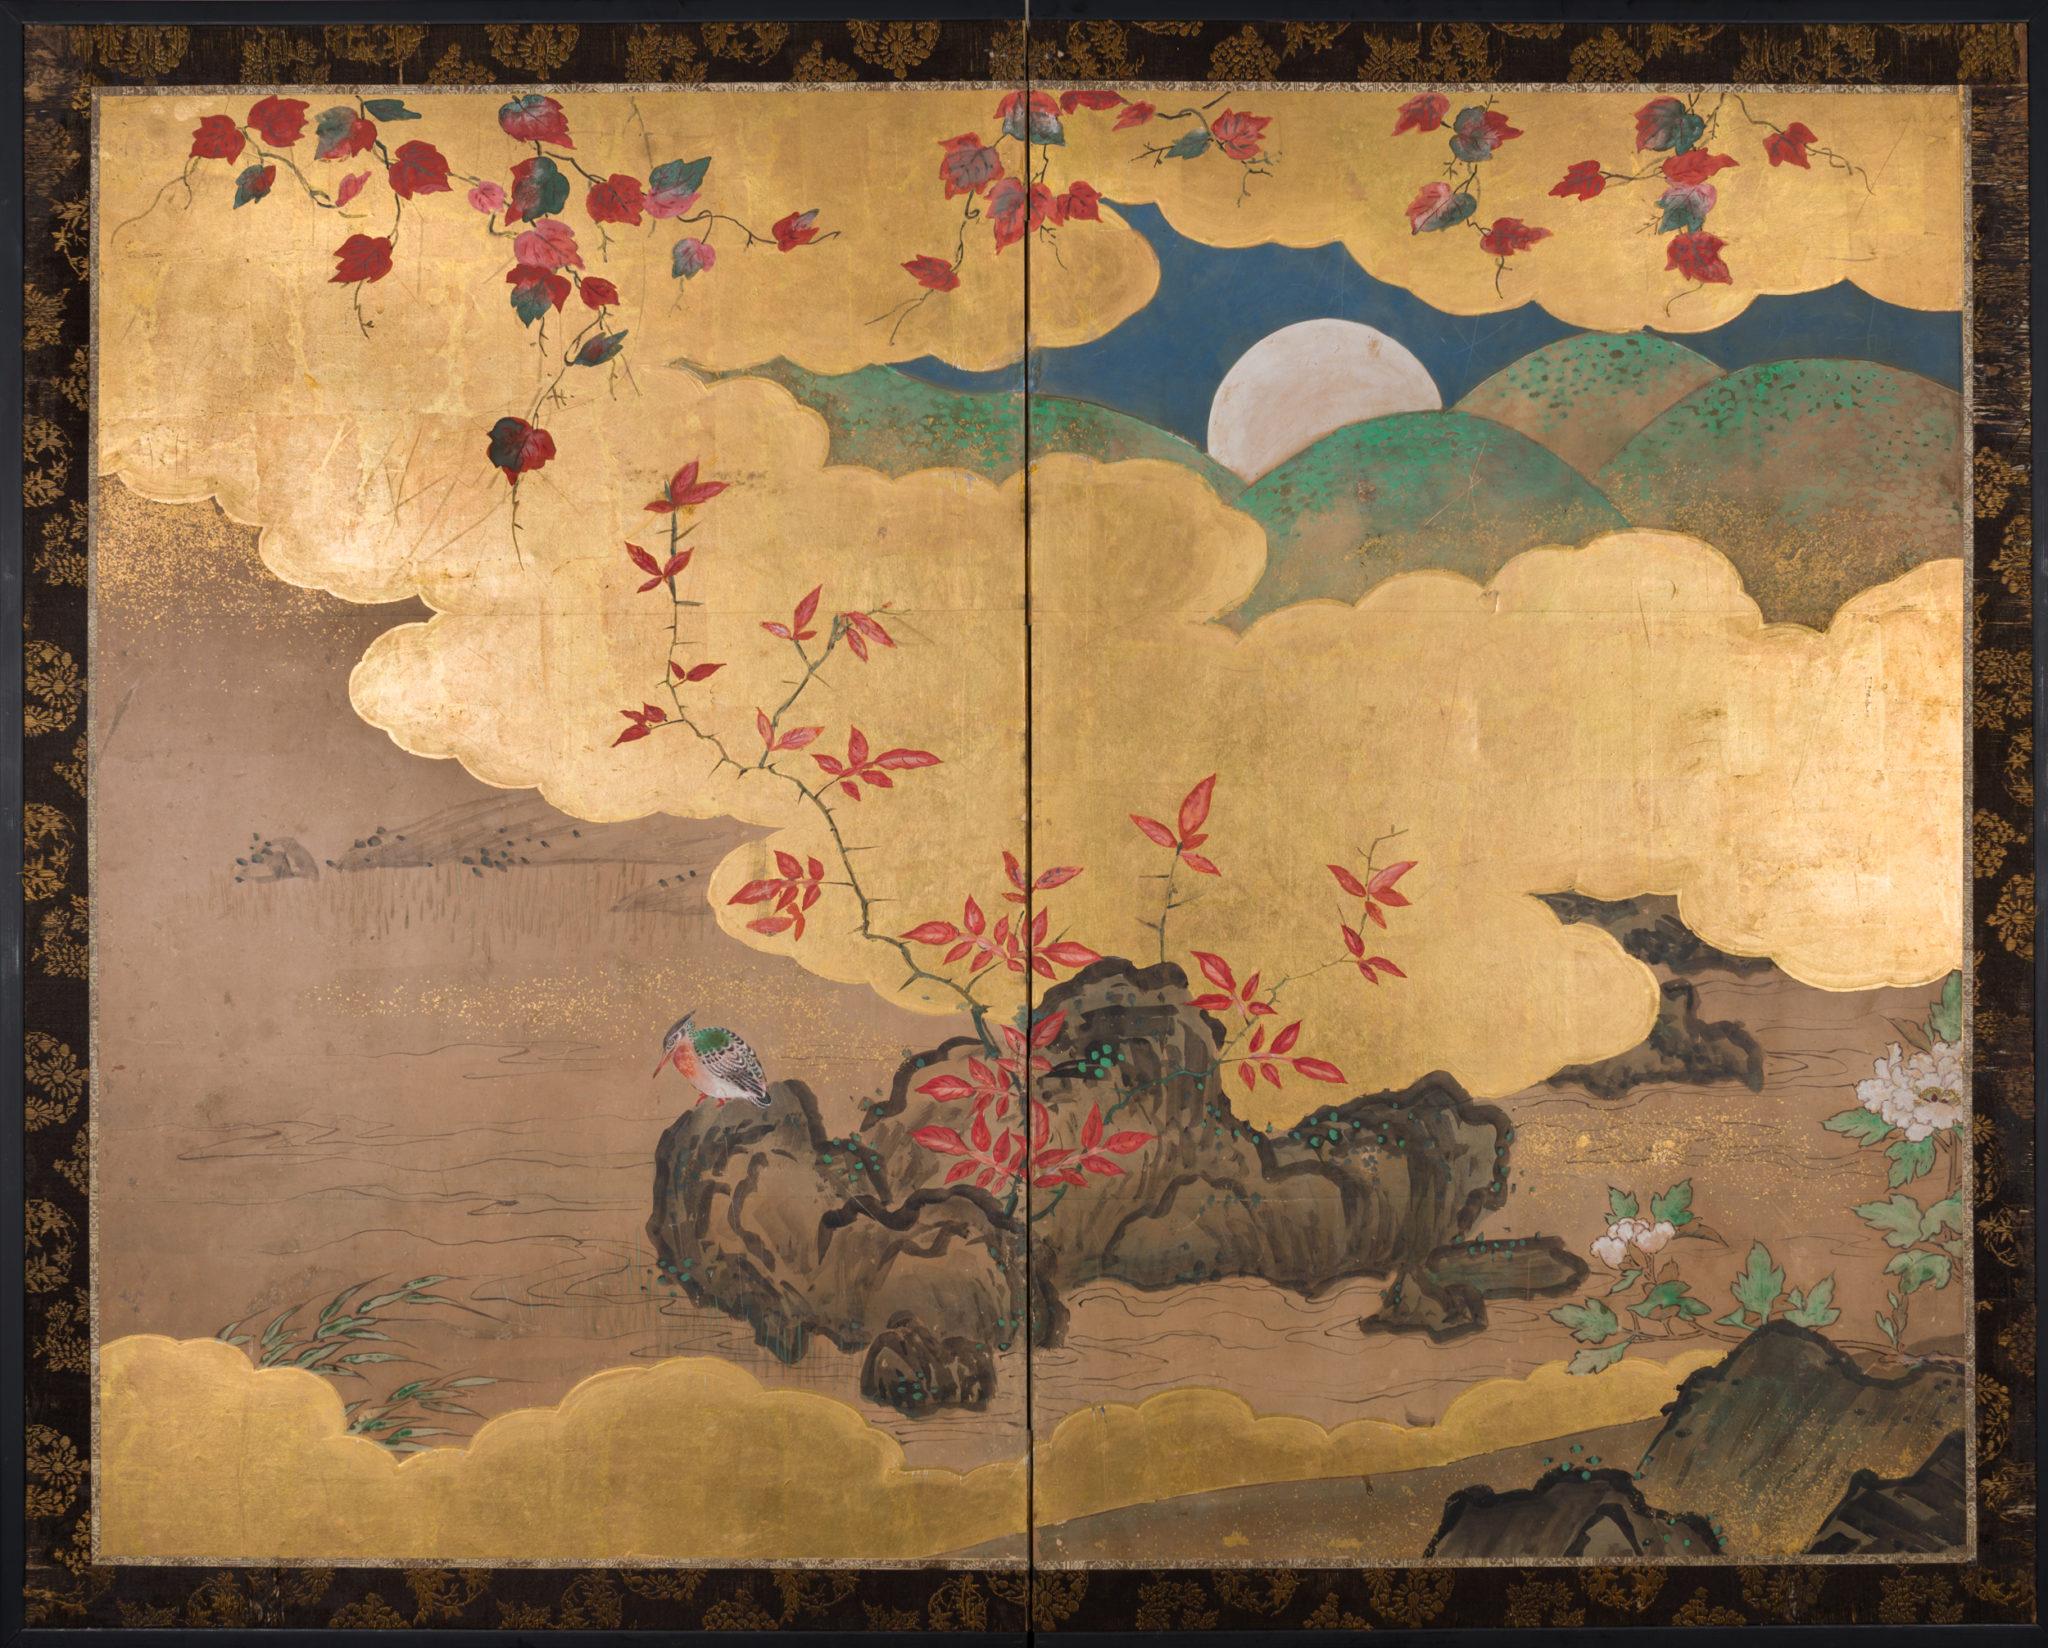 Japanese Screens, Japanese screen, Byobu, Japanese folding screens, Japanese paintings, Antique Japanese painting, Antique Japanese screens, Japanese antiques, Japanese art